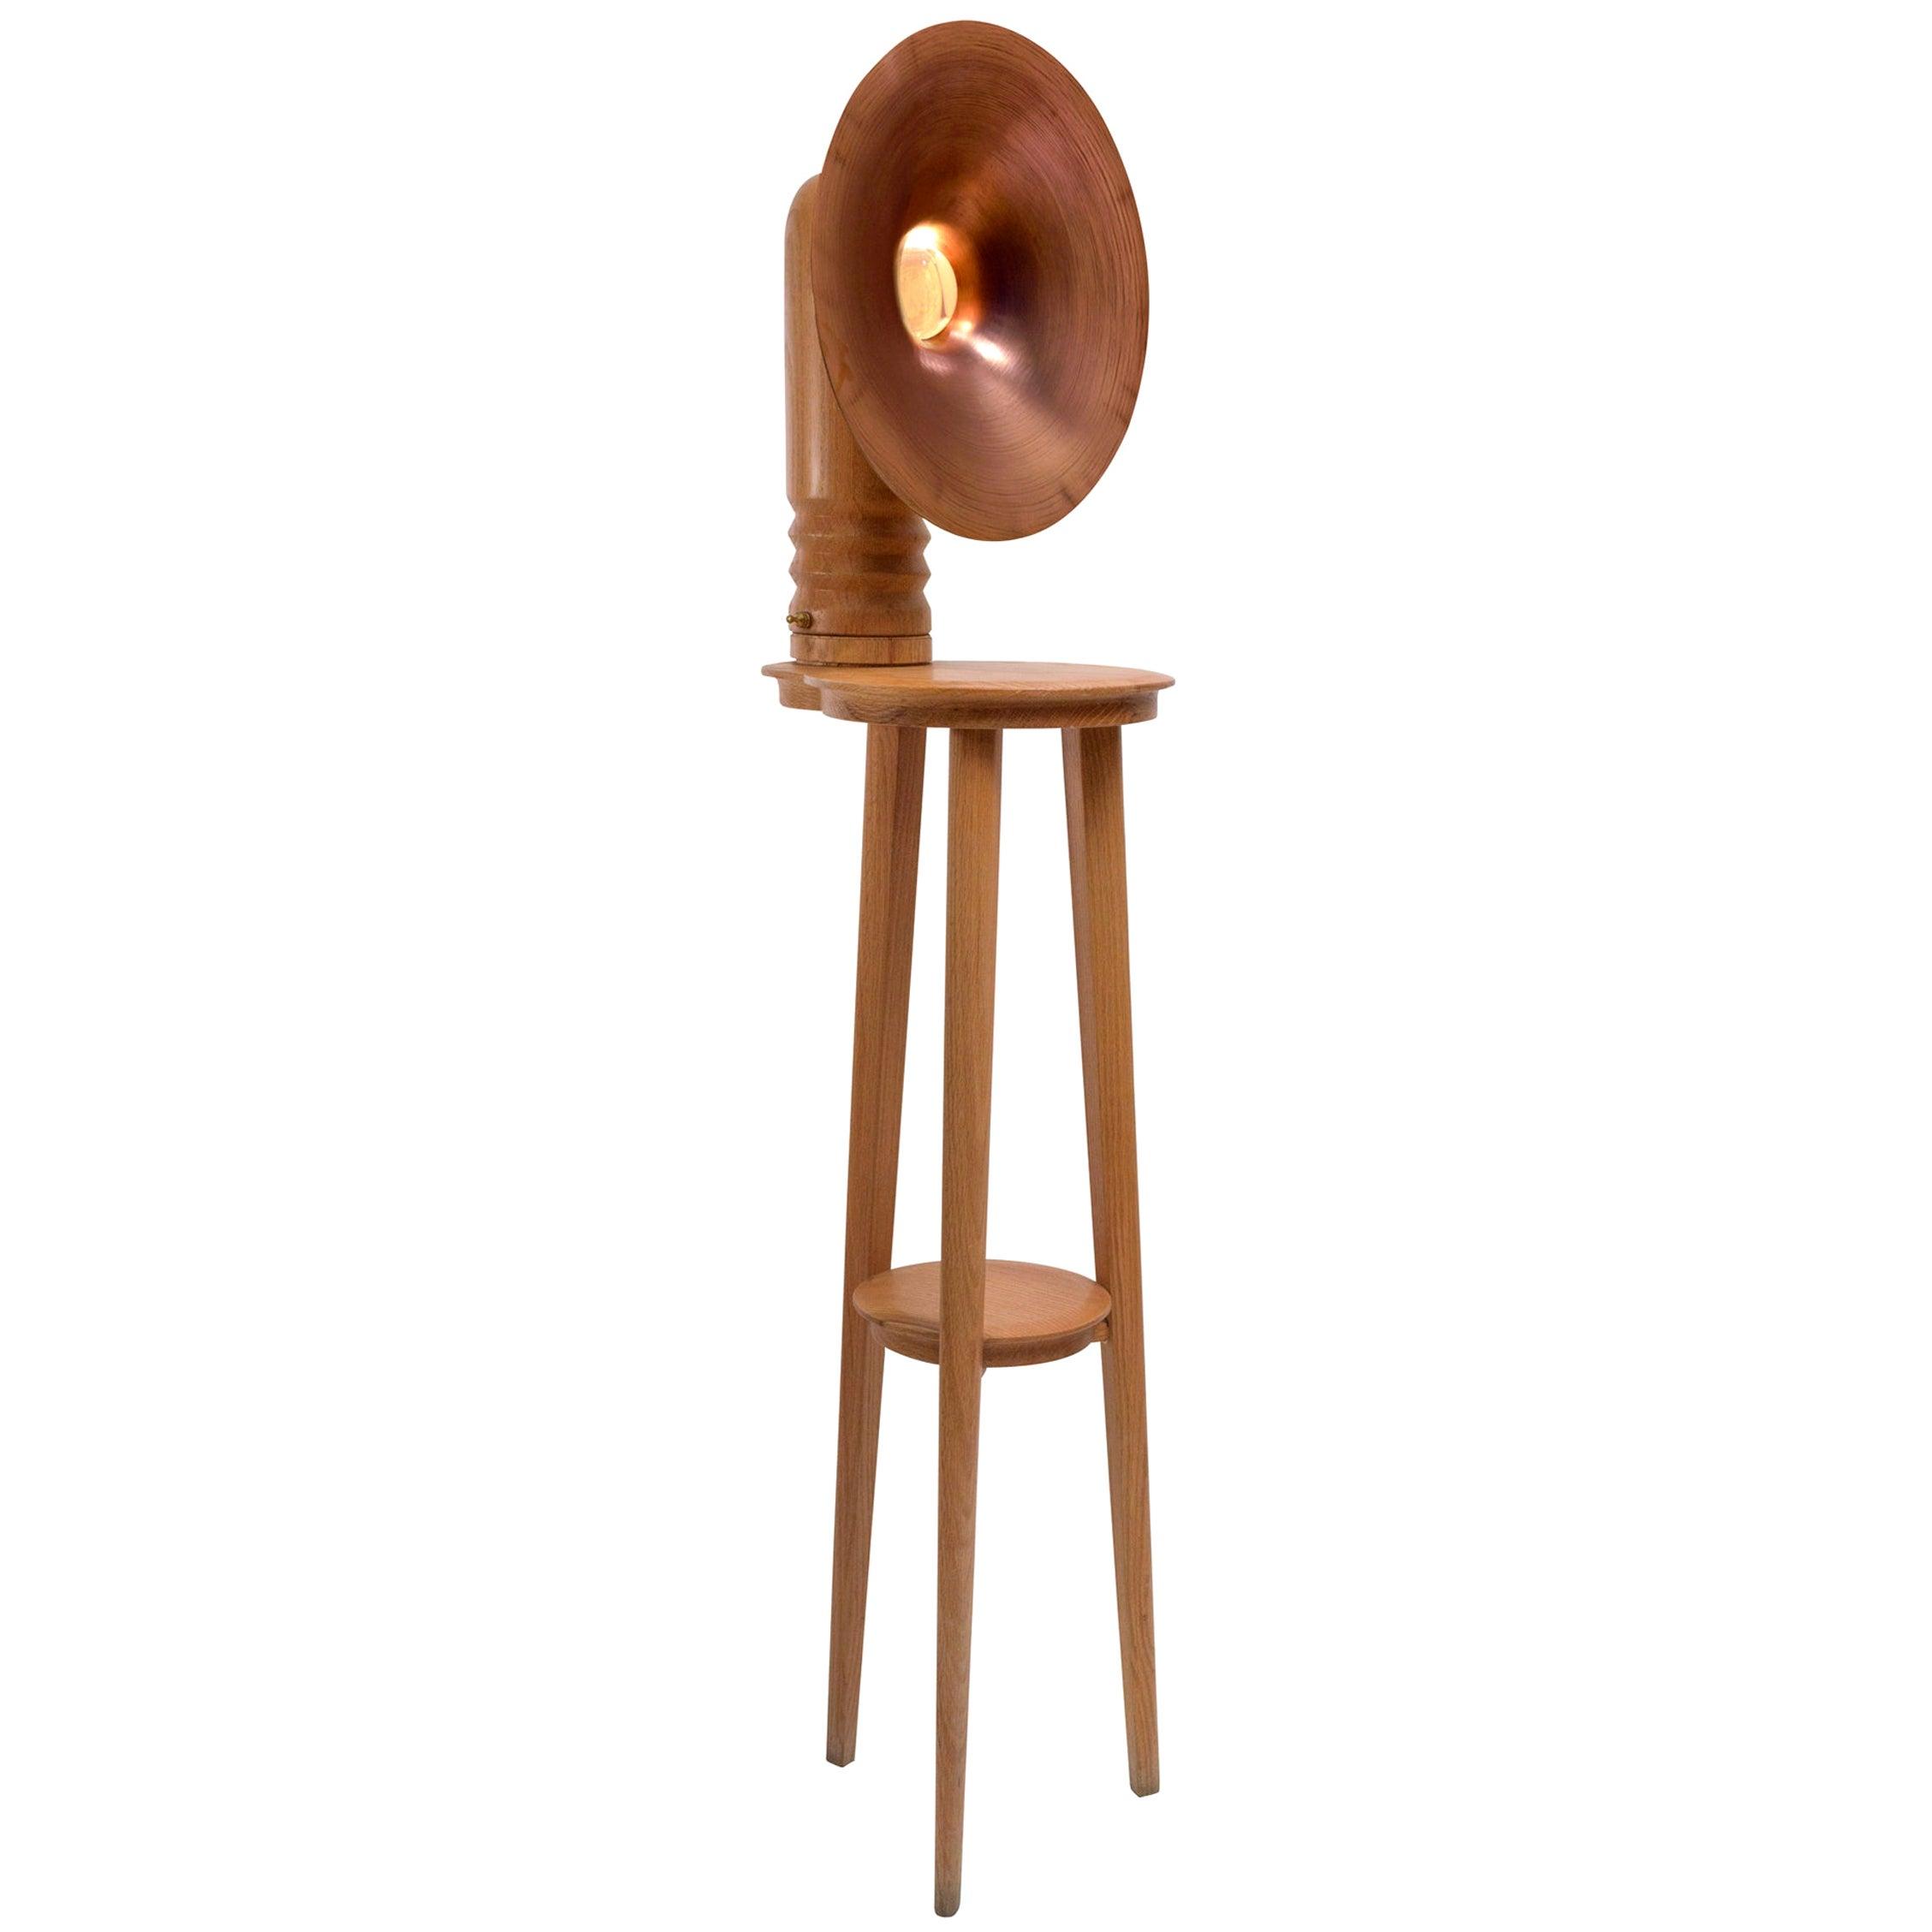 Sousaphone Contemporary Oak Tripod Floor Lamp with Copper Screen